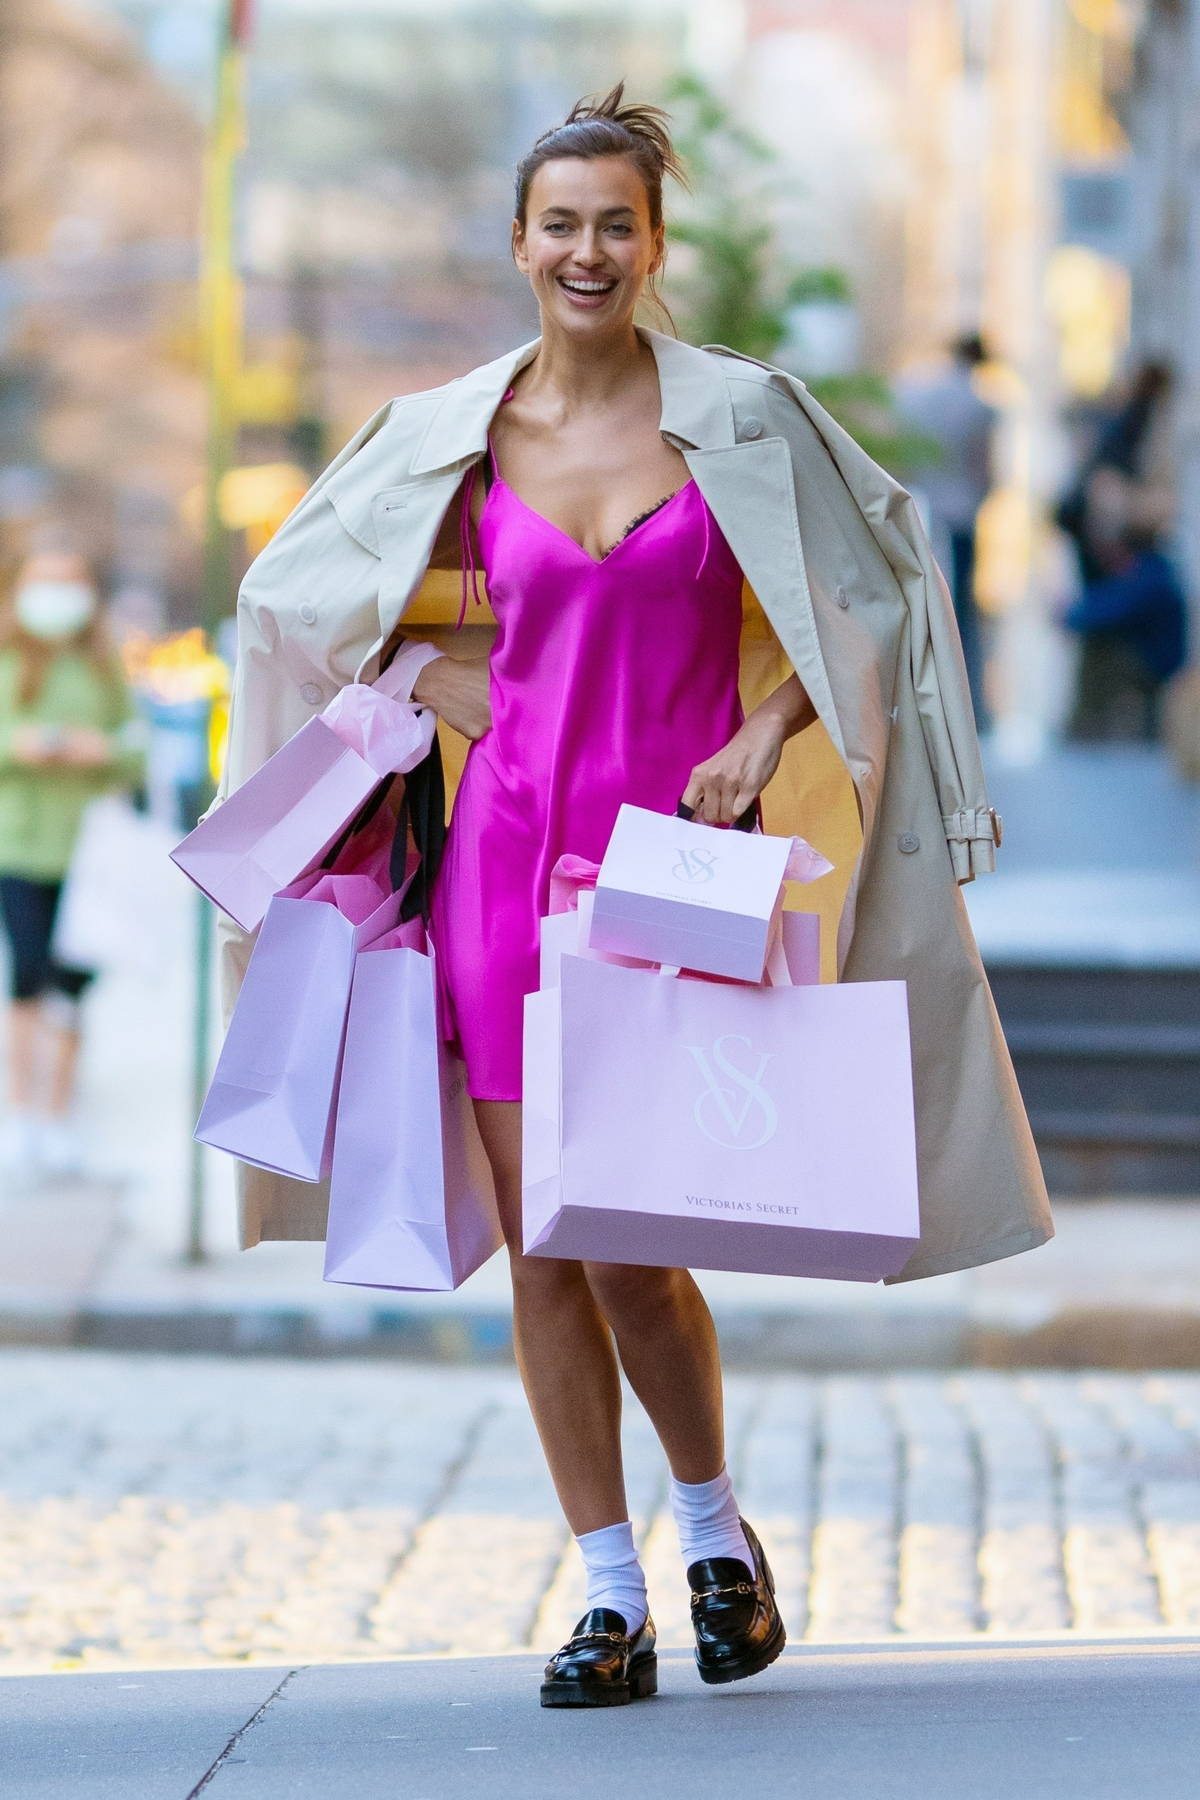 Irina Shayk looks stunning in a pink satin slip dress during a Victoria's Secret photoshoot in Tribeca, New York